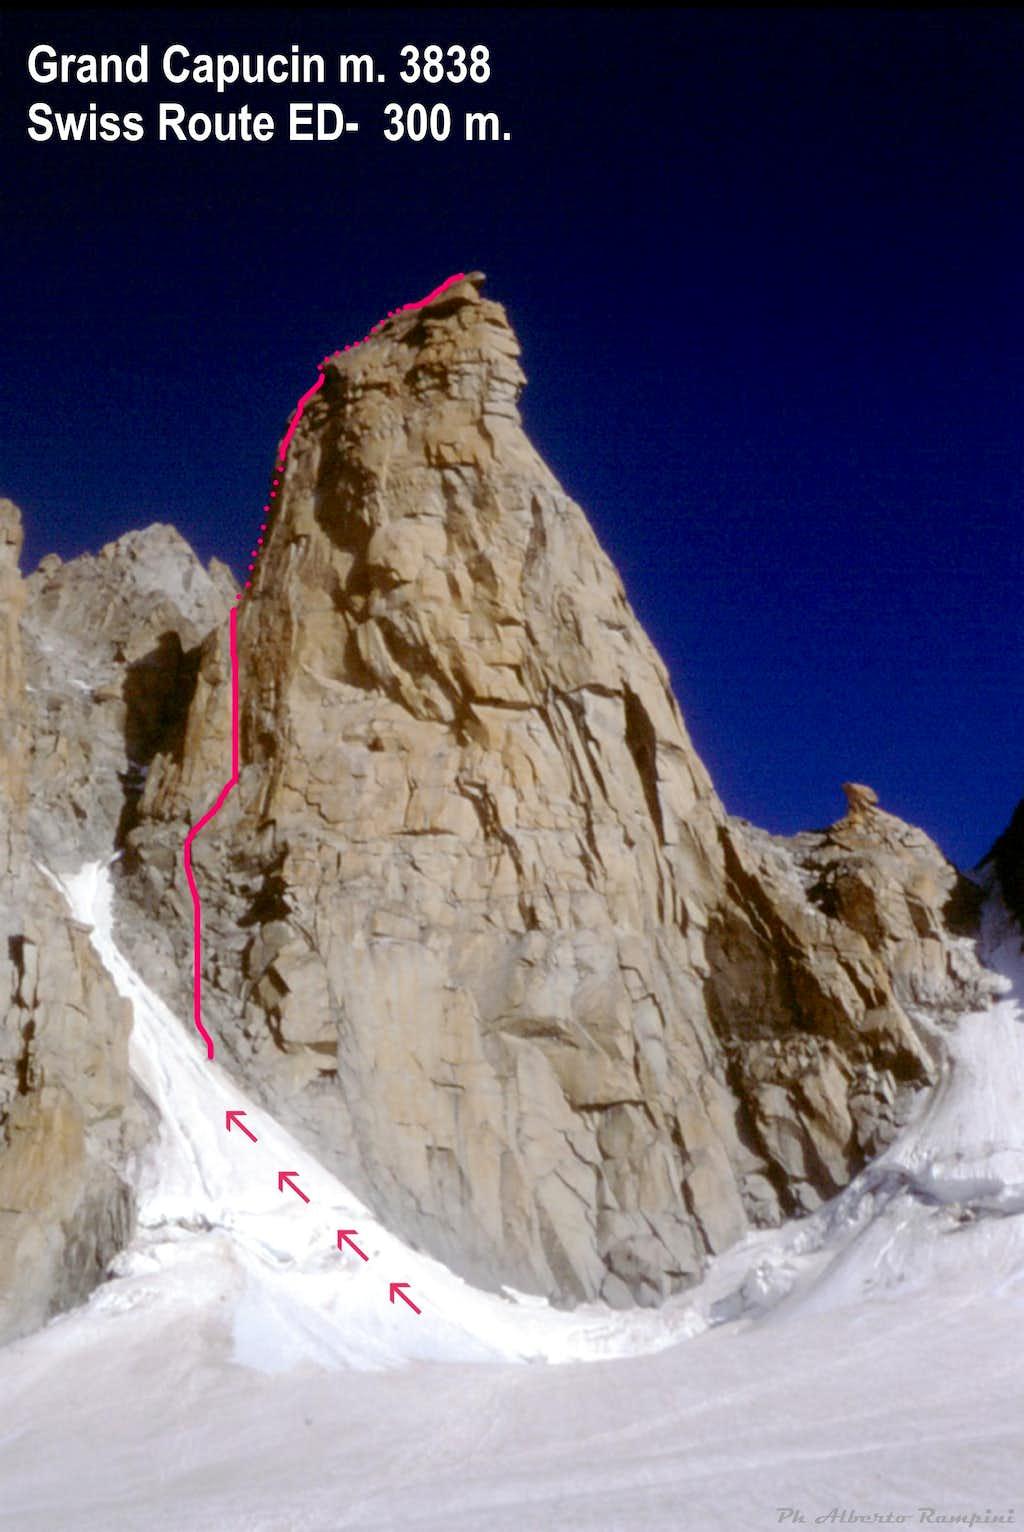 Swiss Route topo